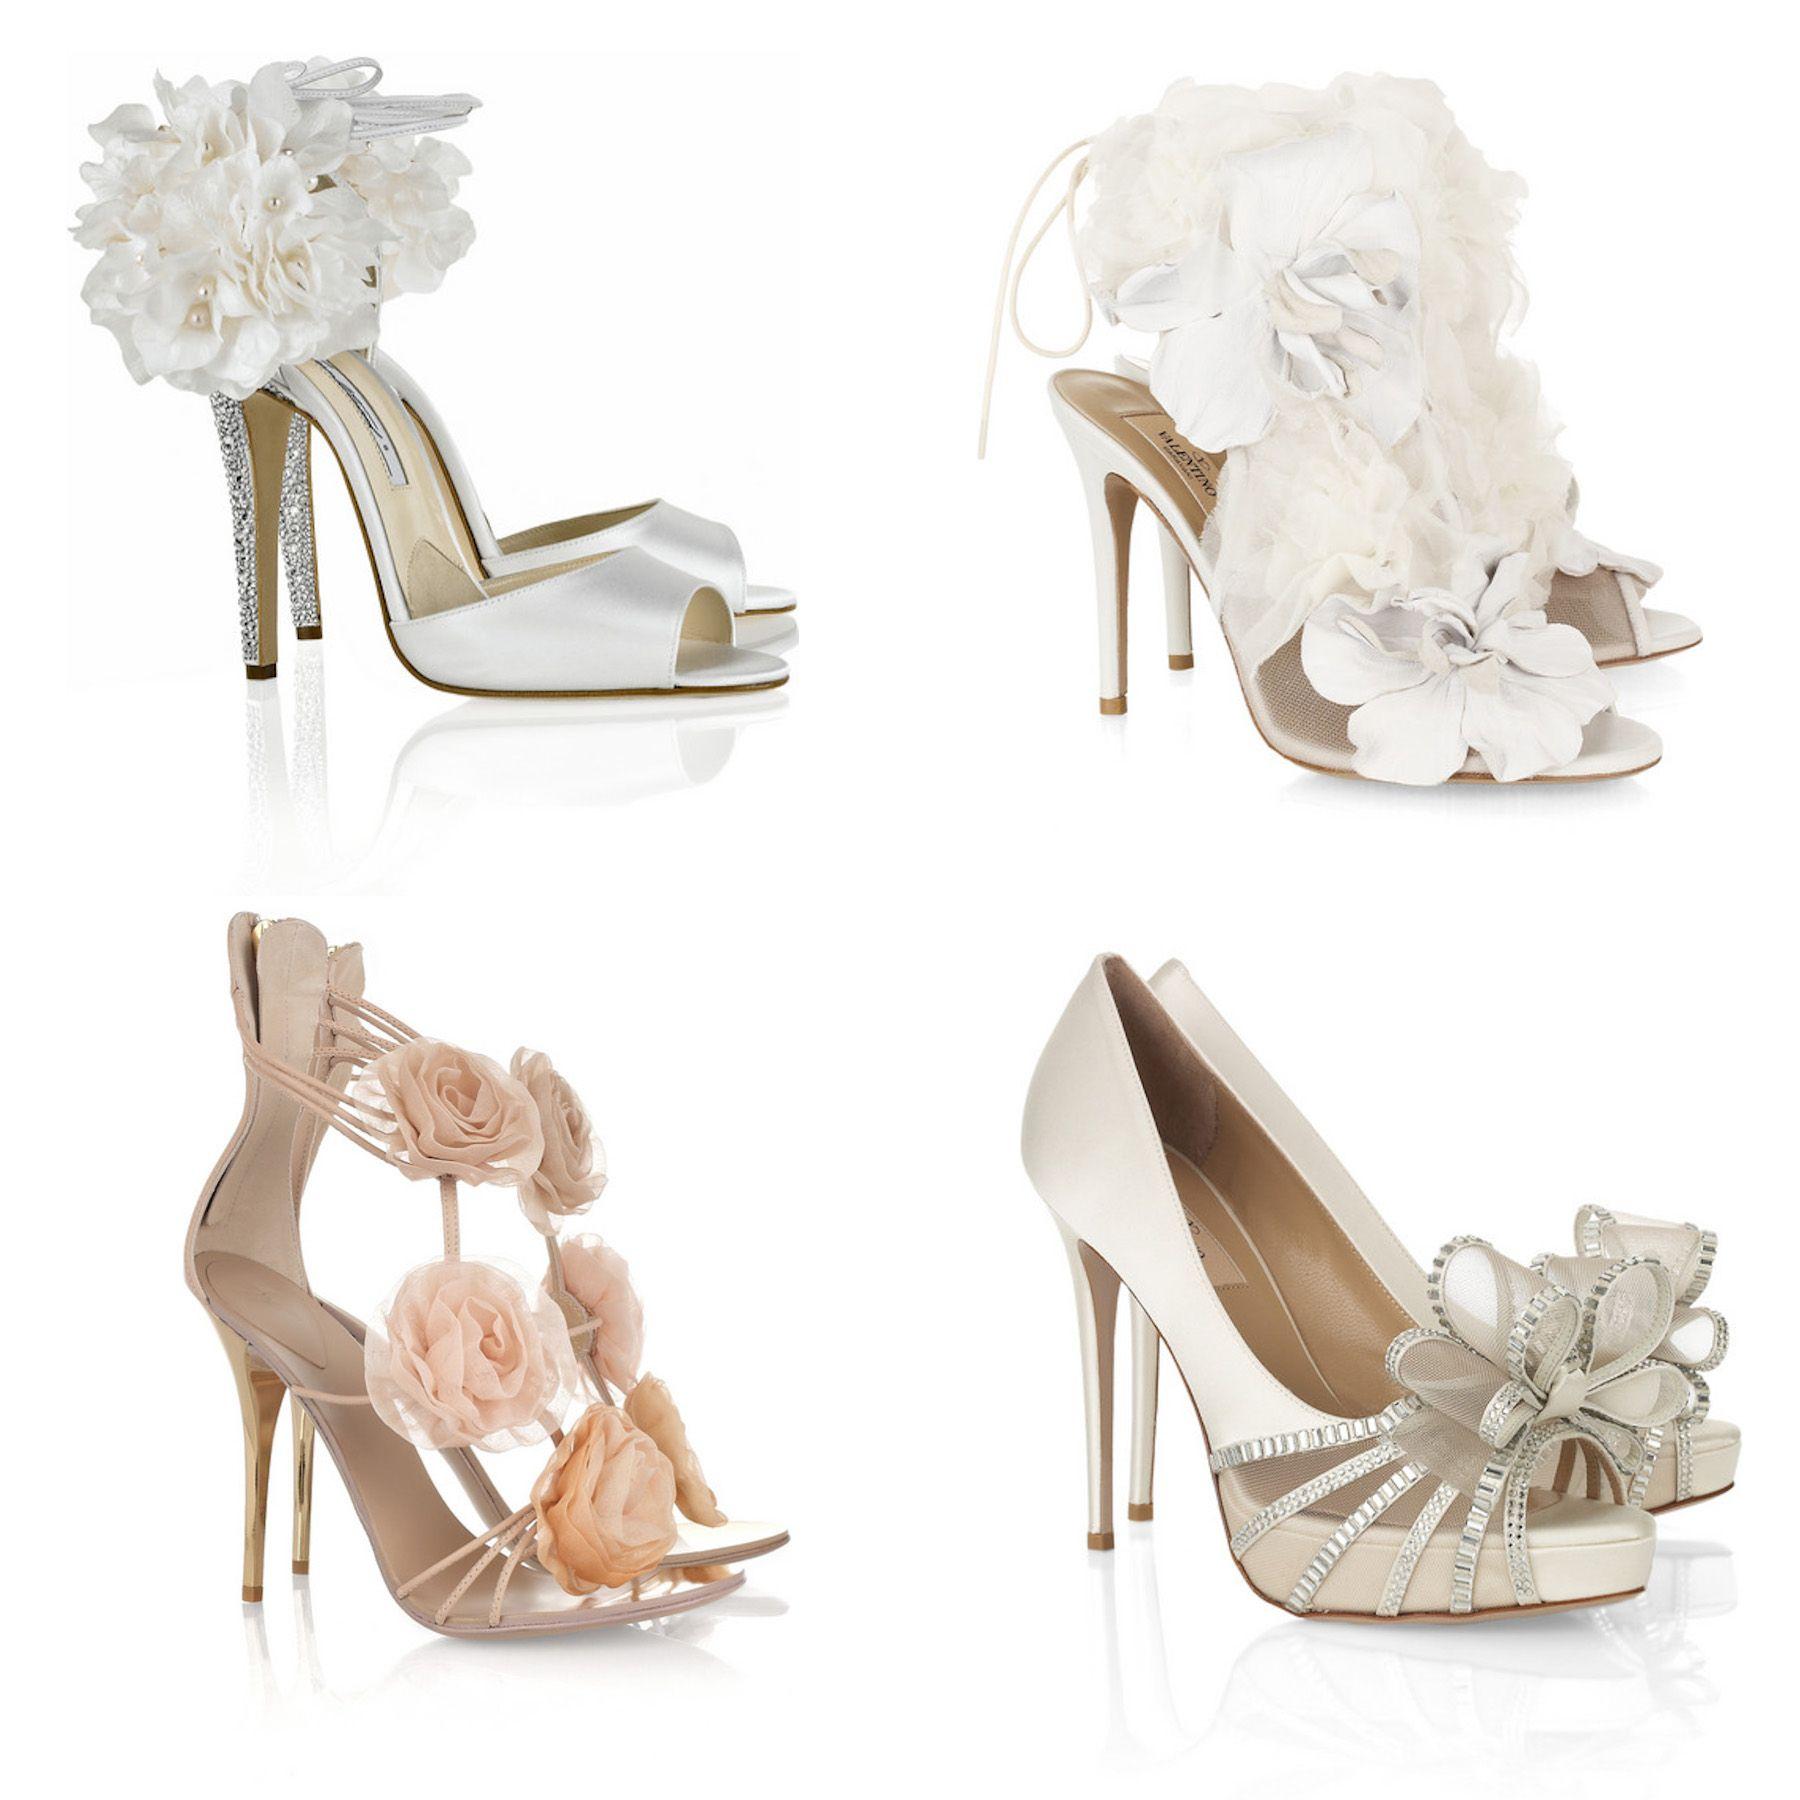 Valentino Wedding Shoes 004 - Valentino Wedding Shoes